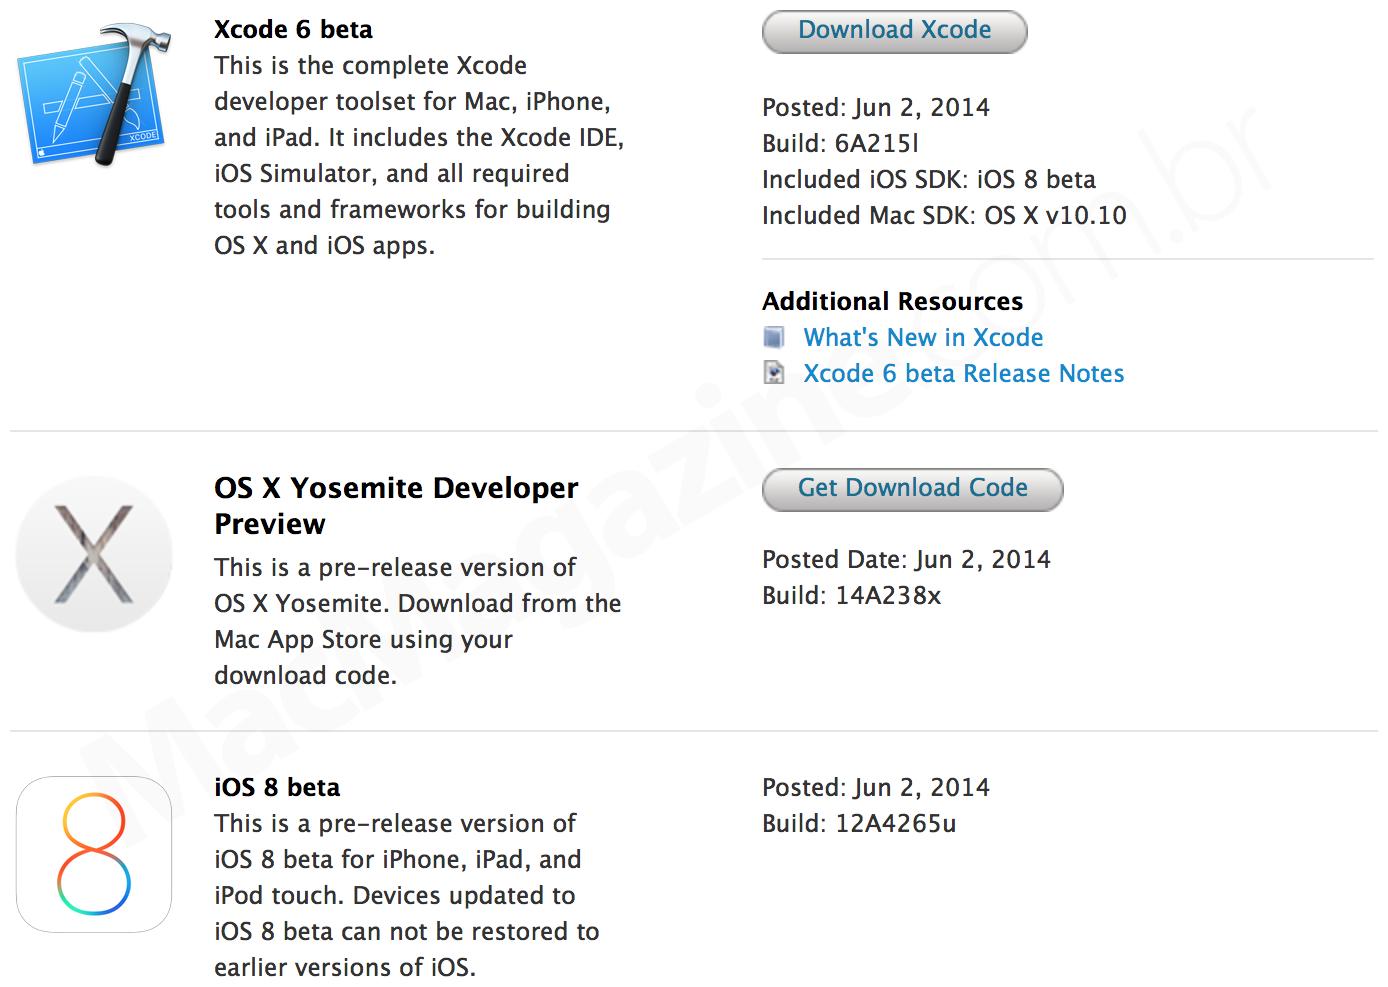 Betas do iOS 8 e do OS X Yosemite